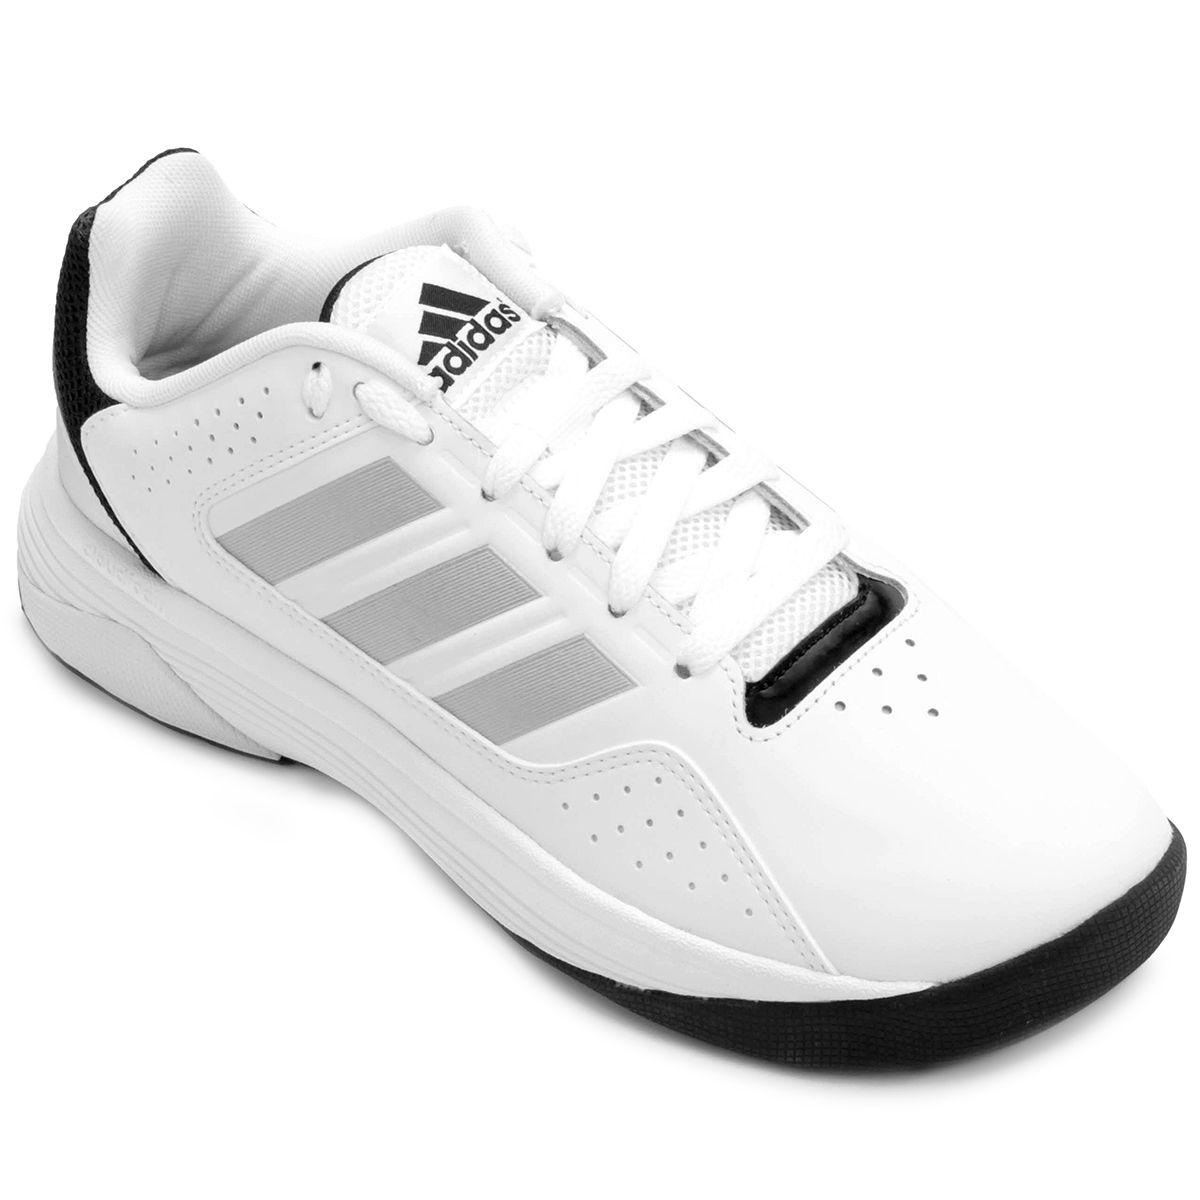 T�nis Adidas Cloudfoam Ilation